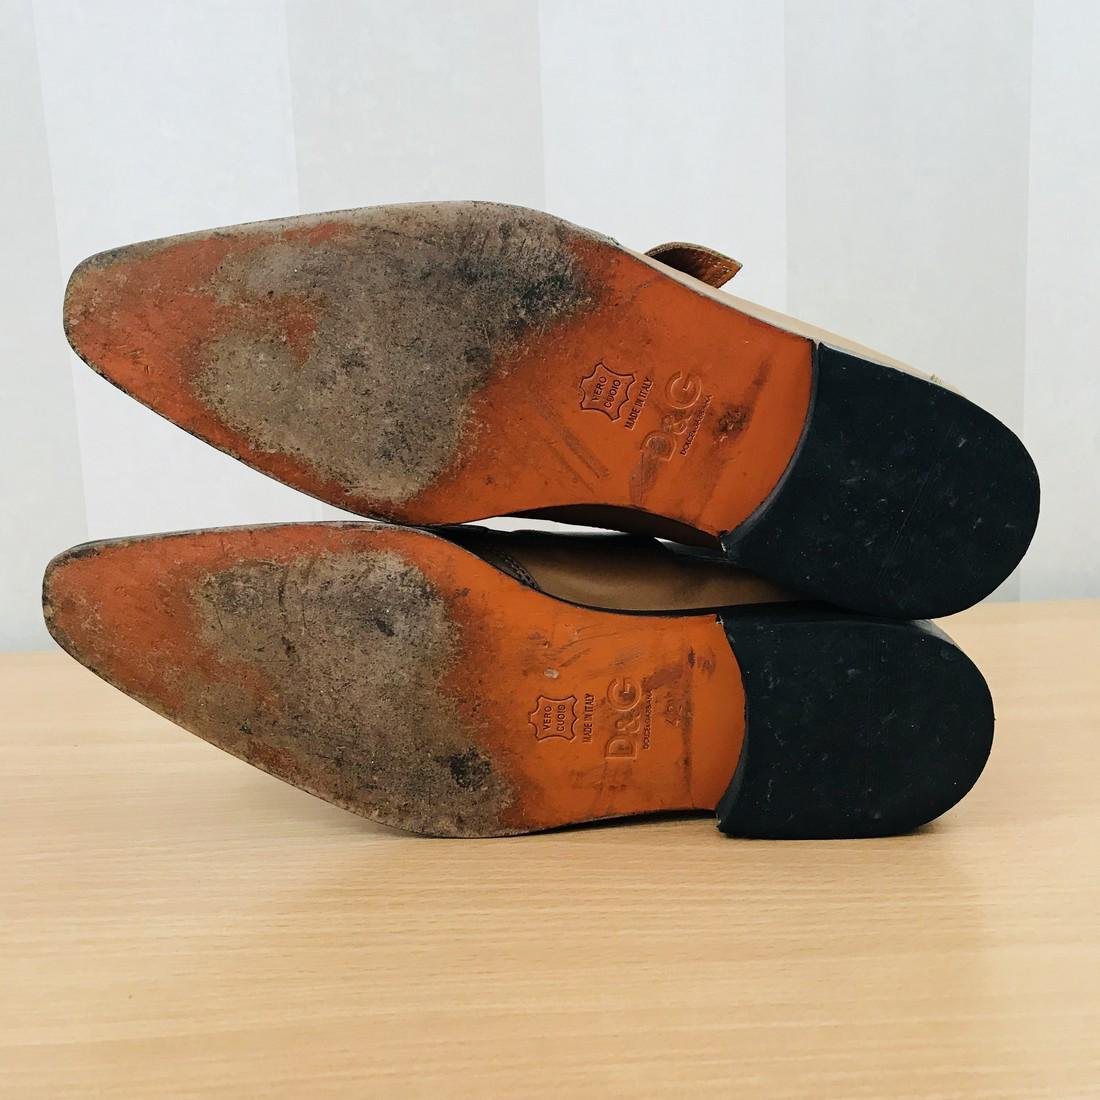 Dolce & Gabbana – Leather Shoes Size EUR 42 UK 8.5 US 9 - 8